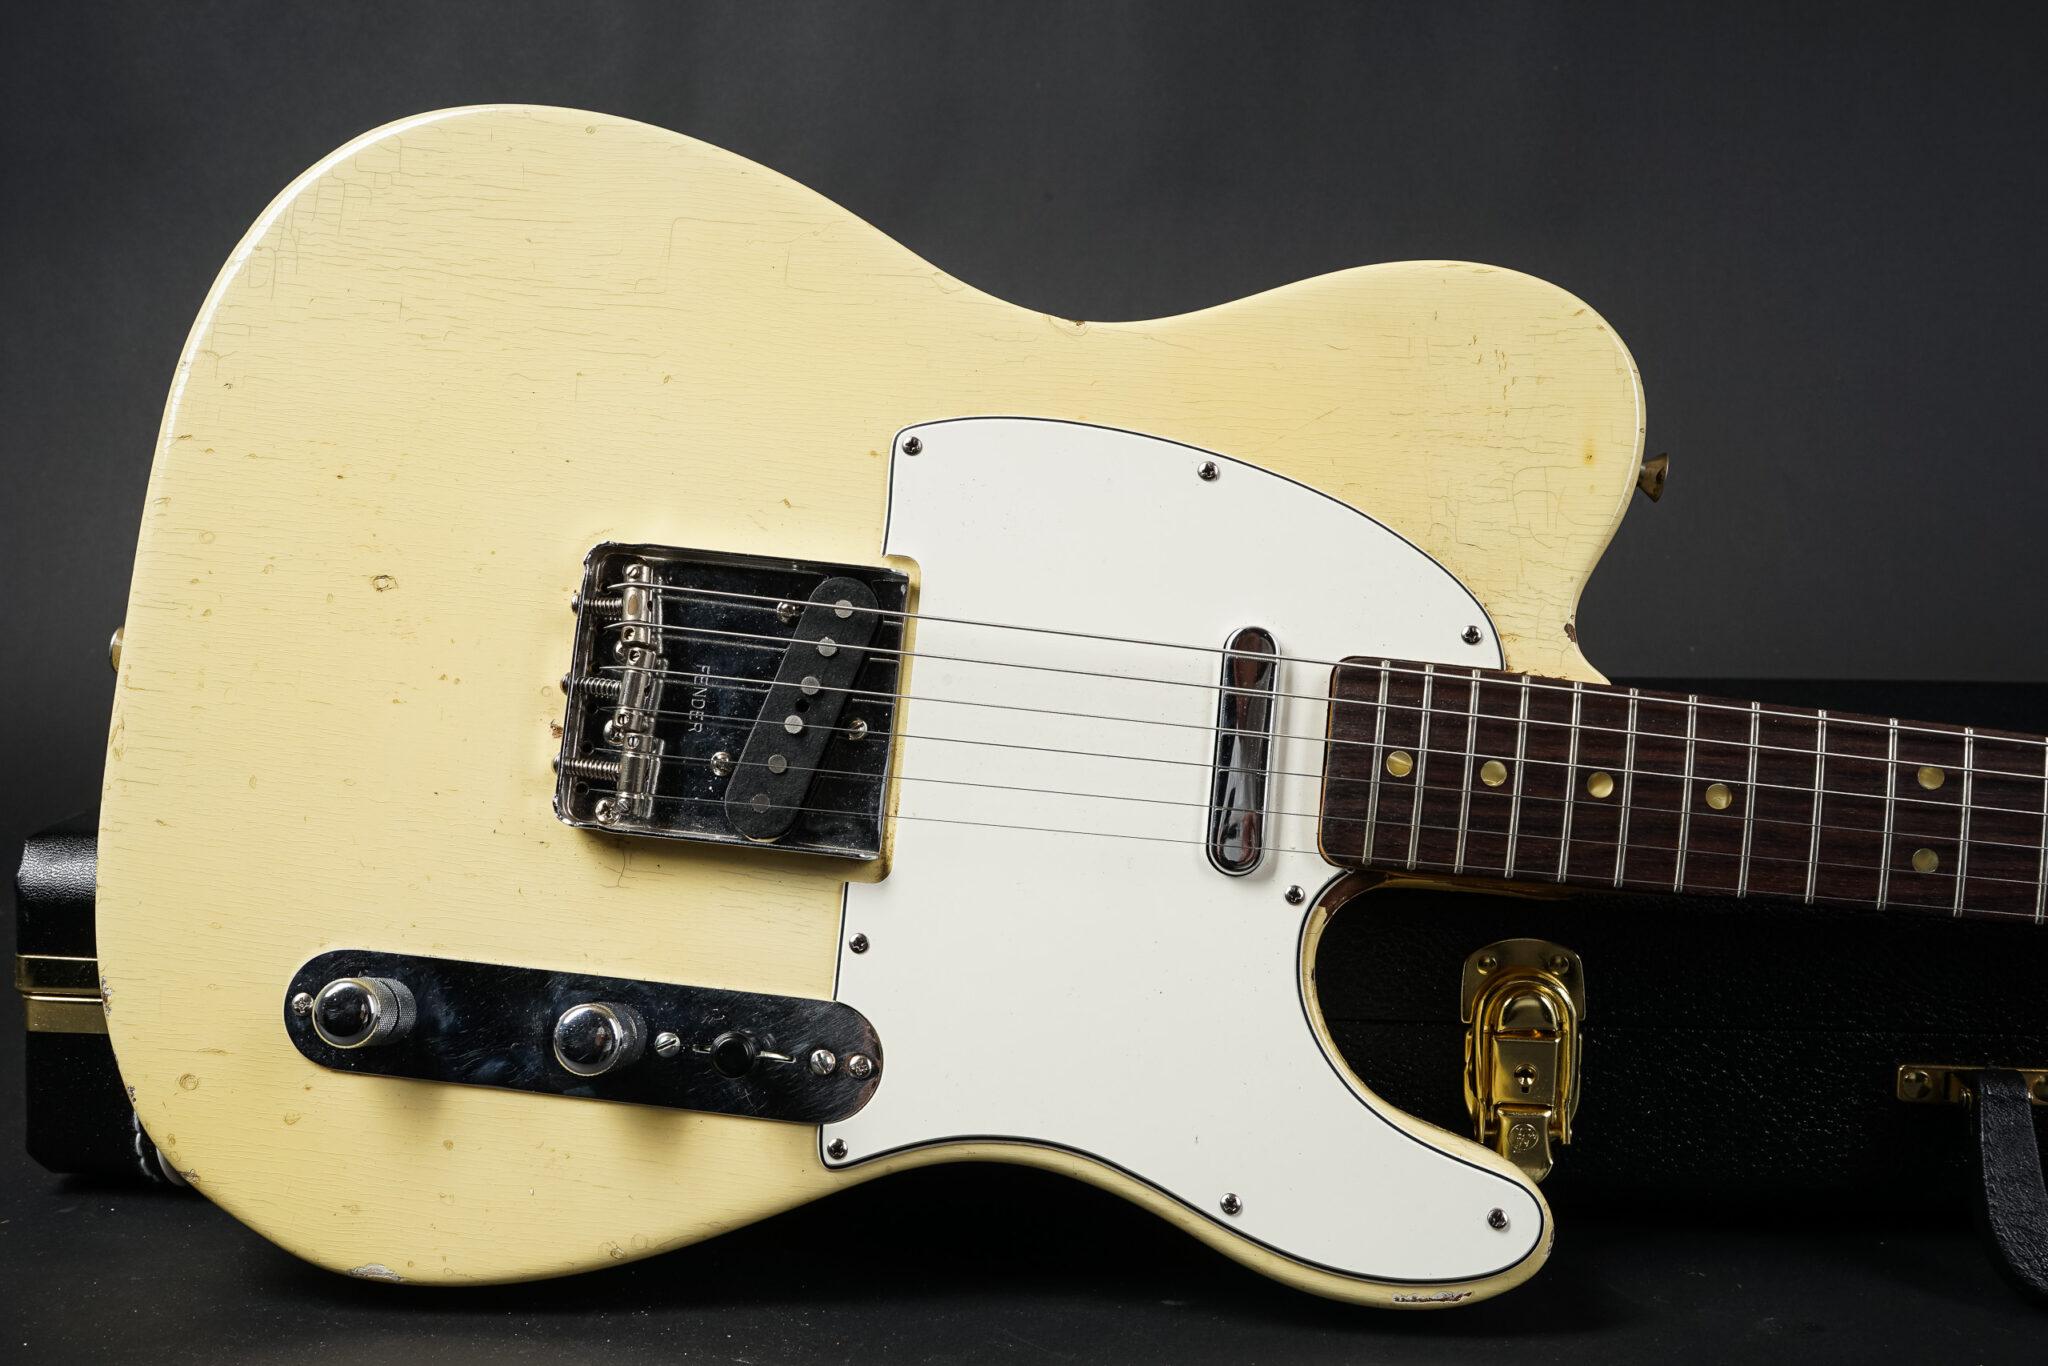 https://guitarpoint.de/app/uploads/products/1974-fender-telecaster-blond-7/1973-Fender-Teloeecaster-refin-426066-9-2048x1366.jpg